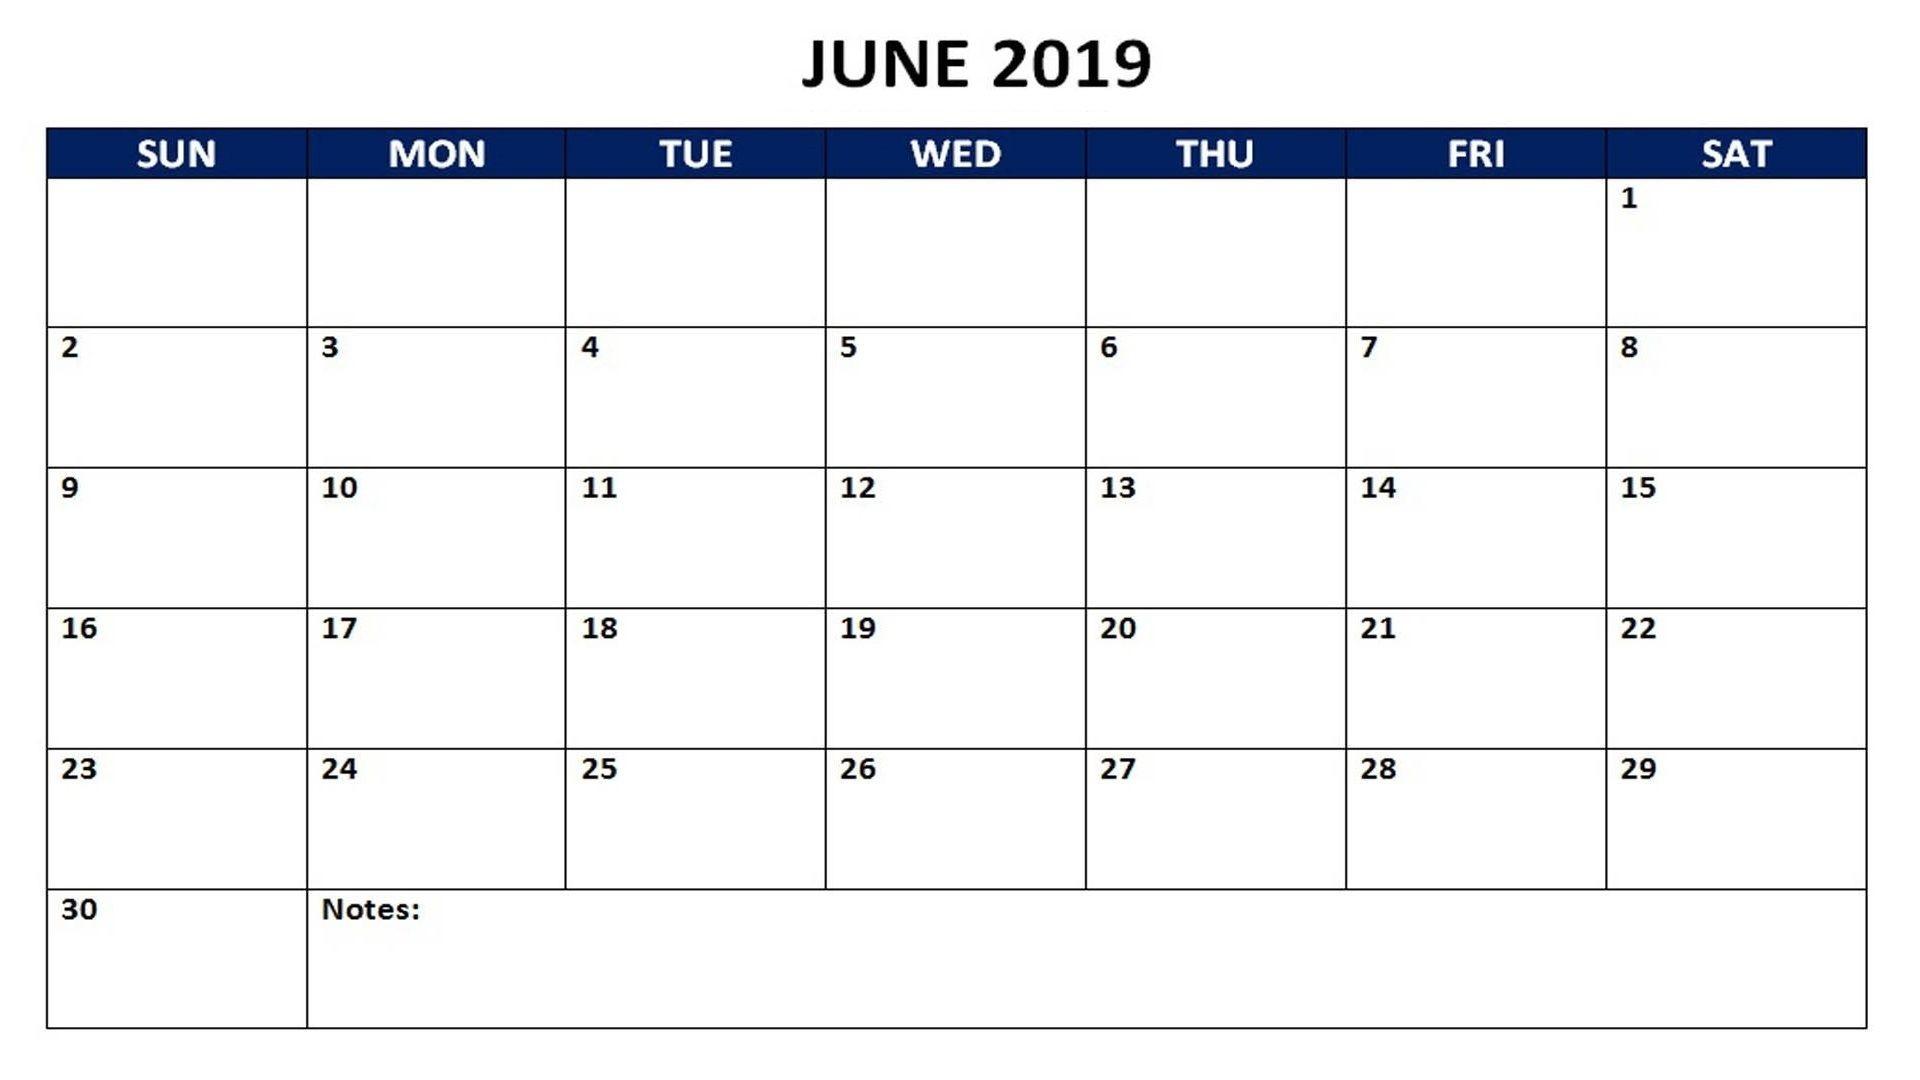 June 2019 Monthly Calendar | 2019 Calendars | Monthly-Monthly Schdule For June